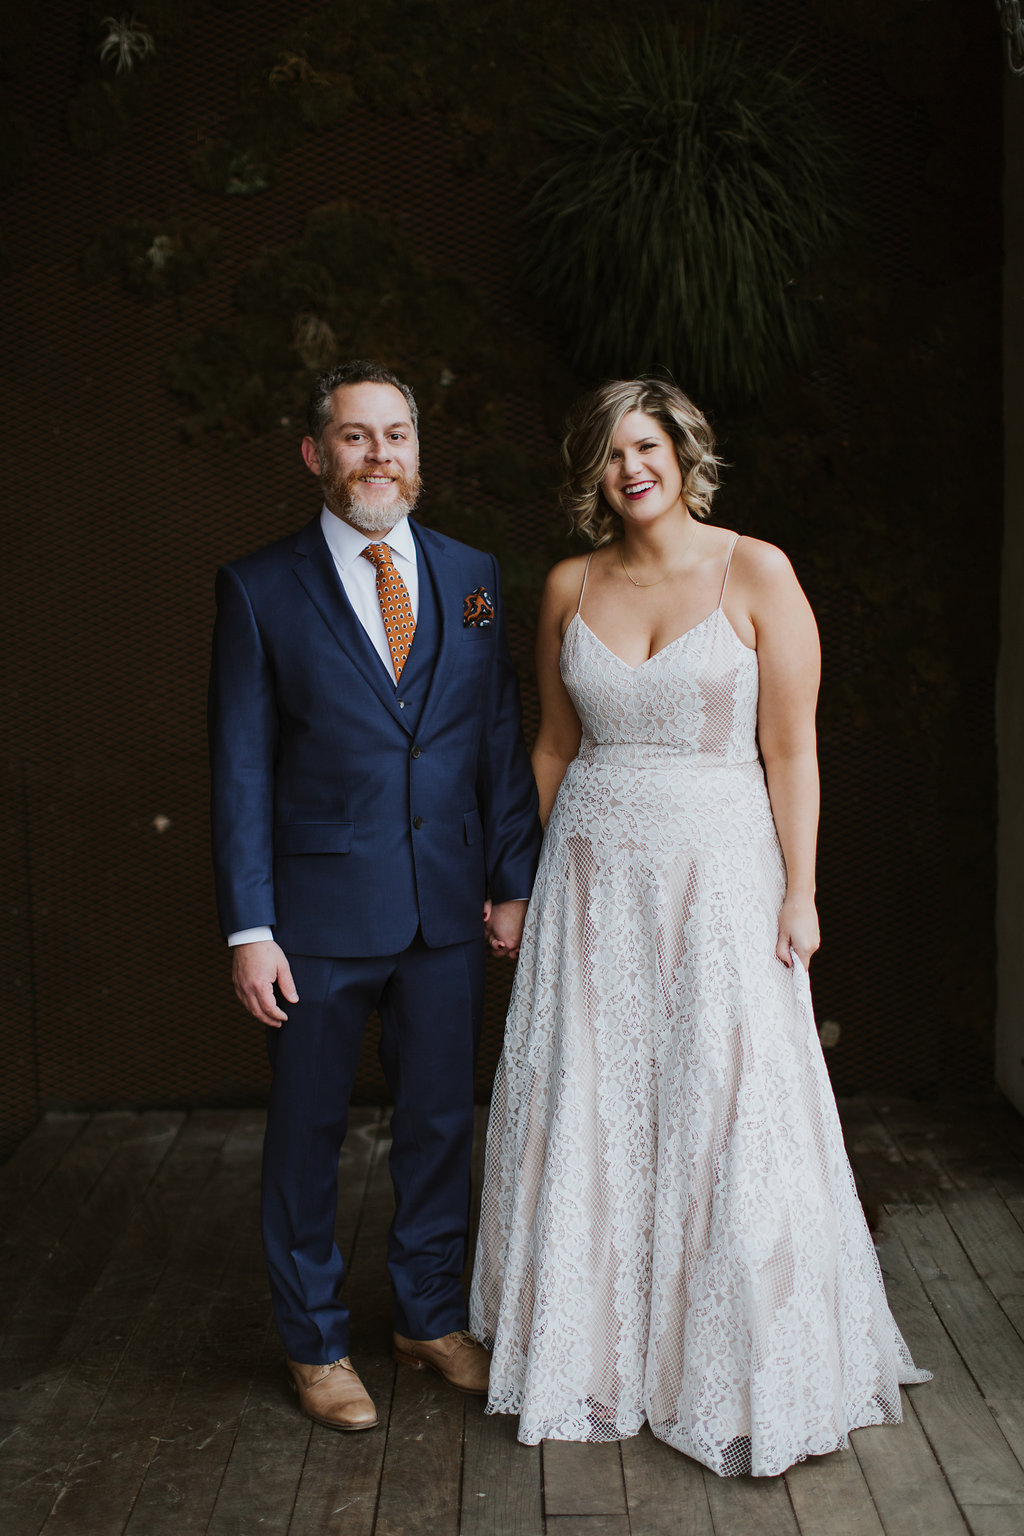 Paige-Newton-Intimate-Wedding-Photographer-Malverde-Wedding-Photography0022.jpg